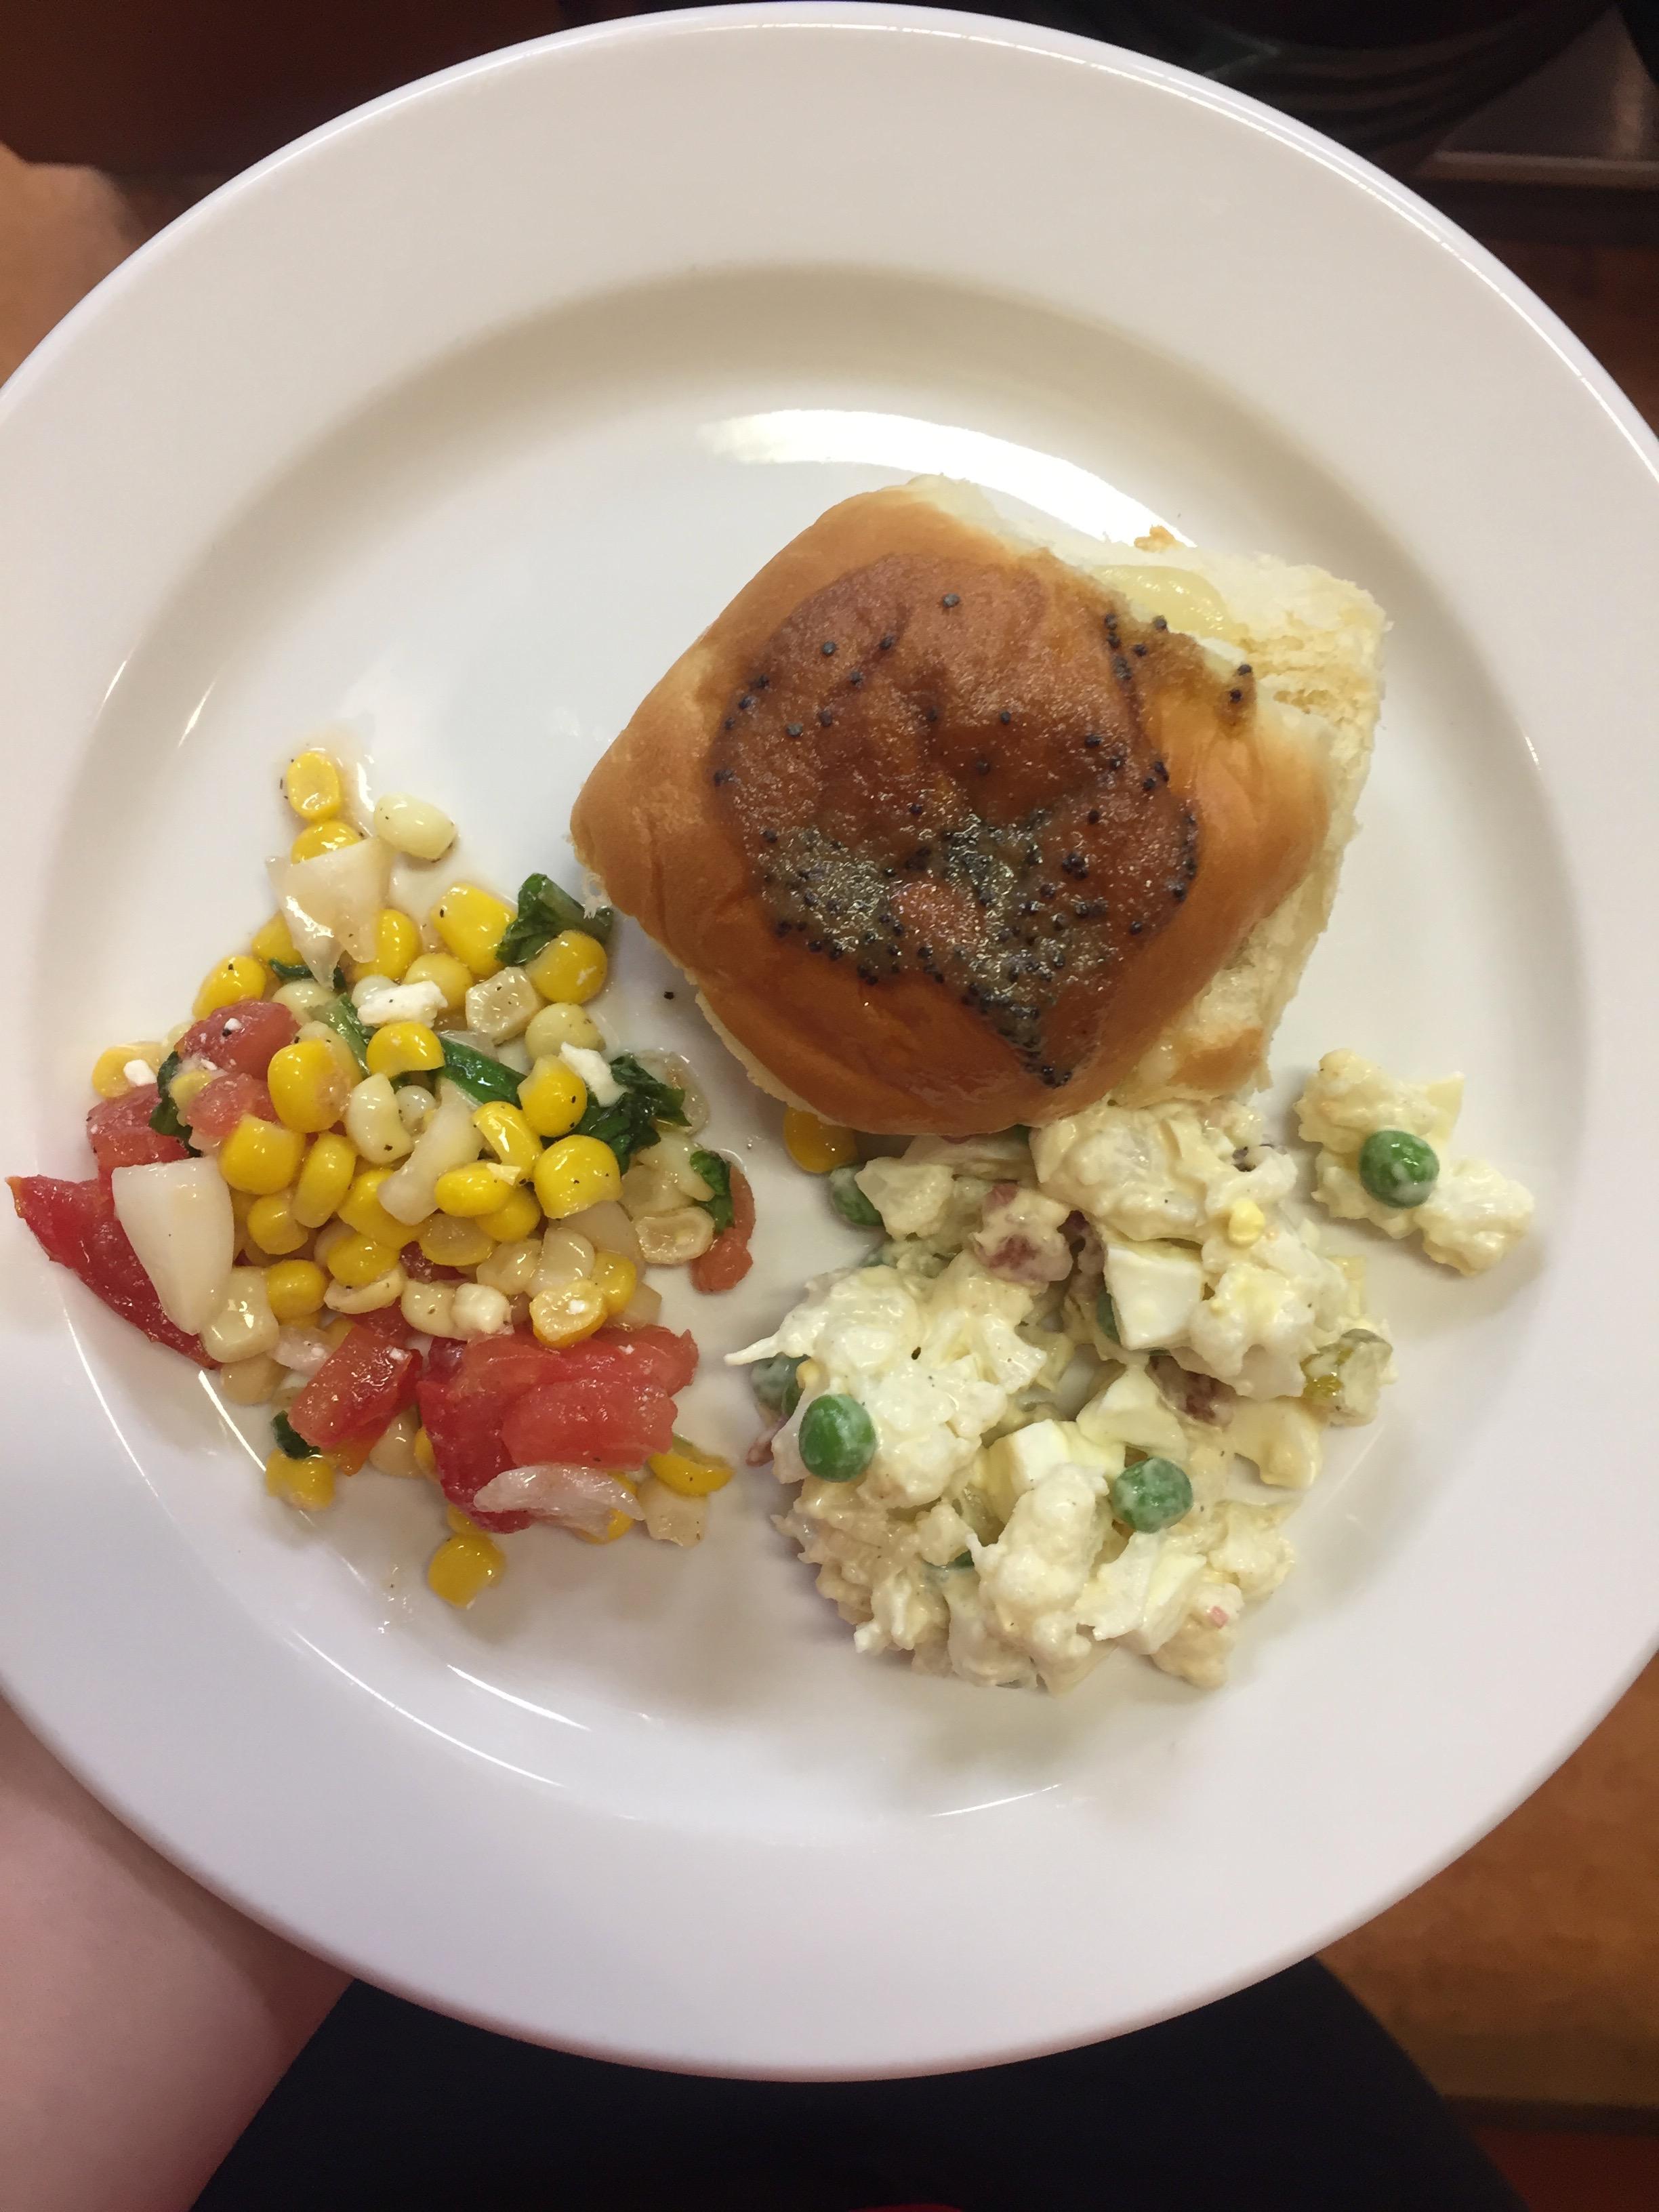 sandwich, corn, and potato salad